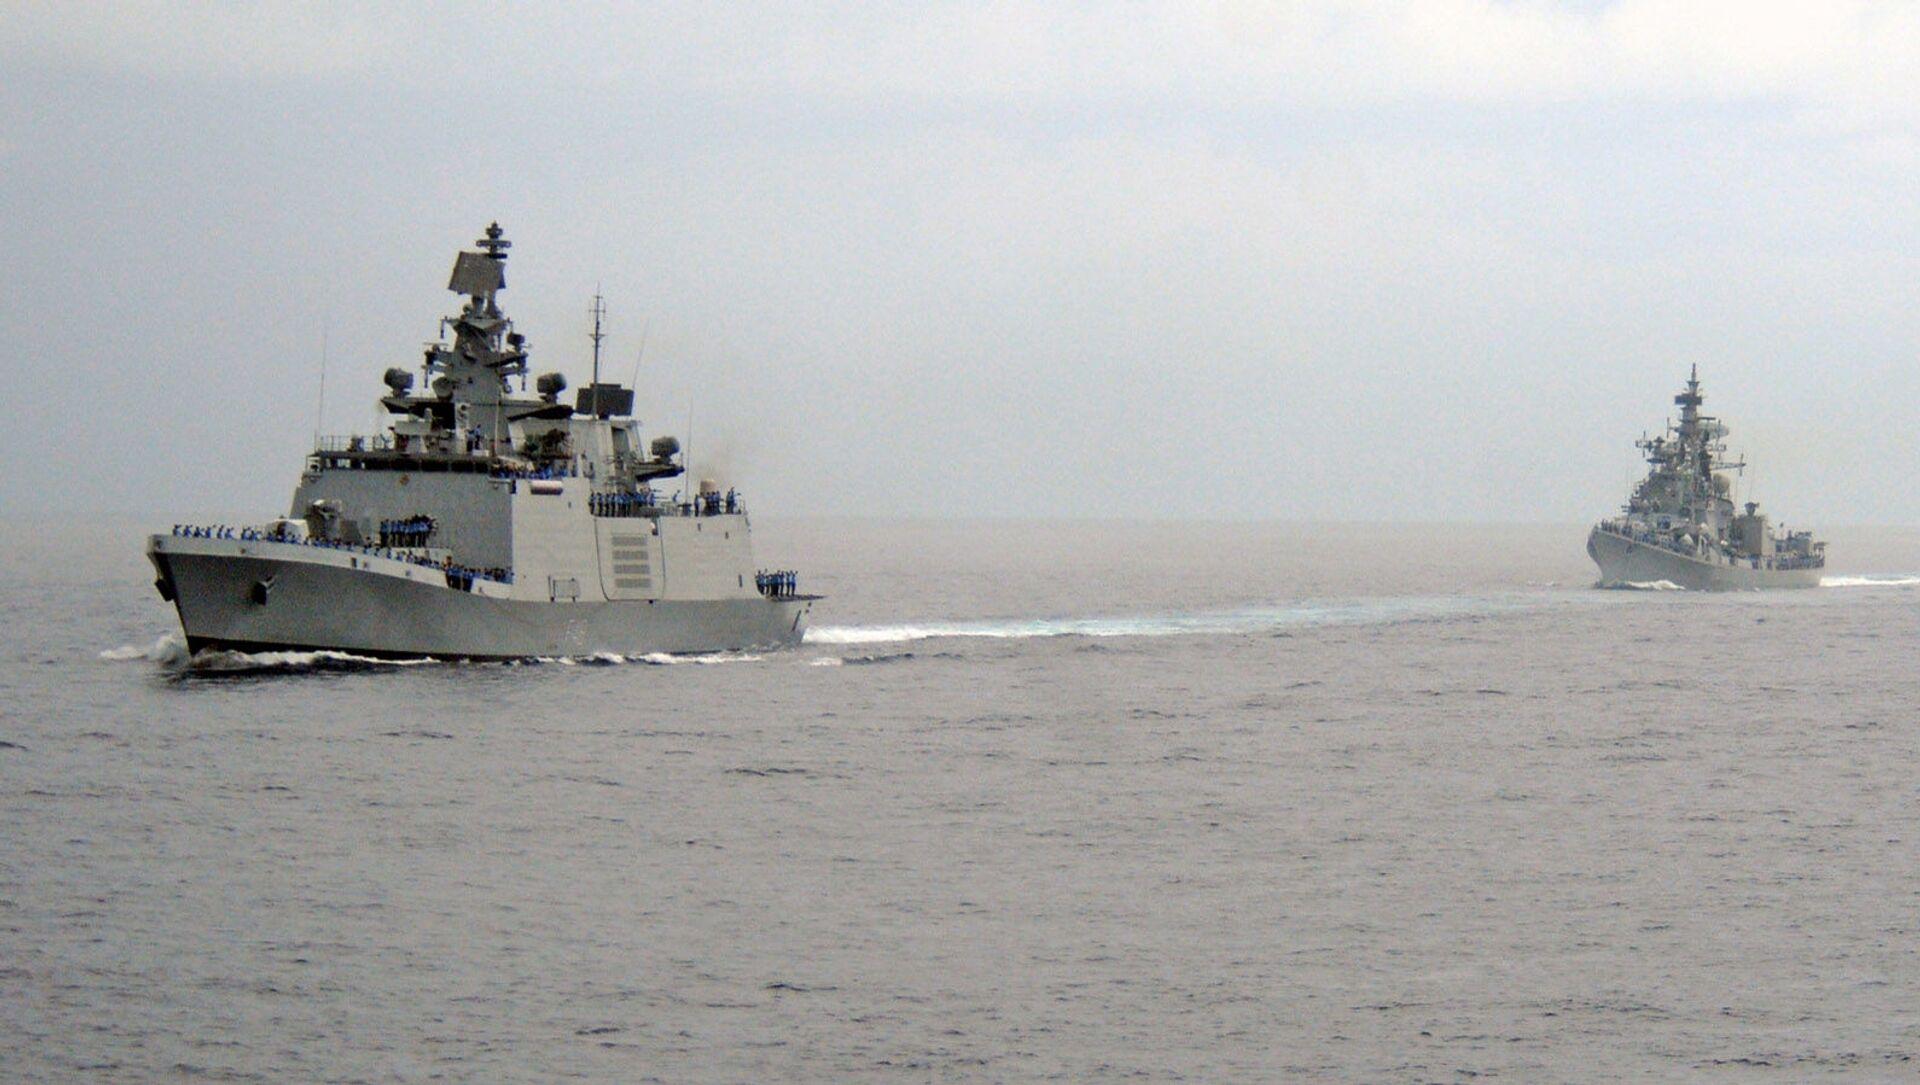 Indian Navy's ships cross the Indian Ocean. - Sputnik International, 1920, 11.08.2021